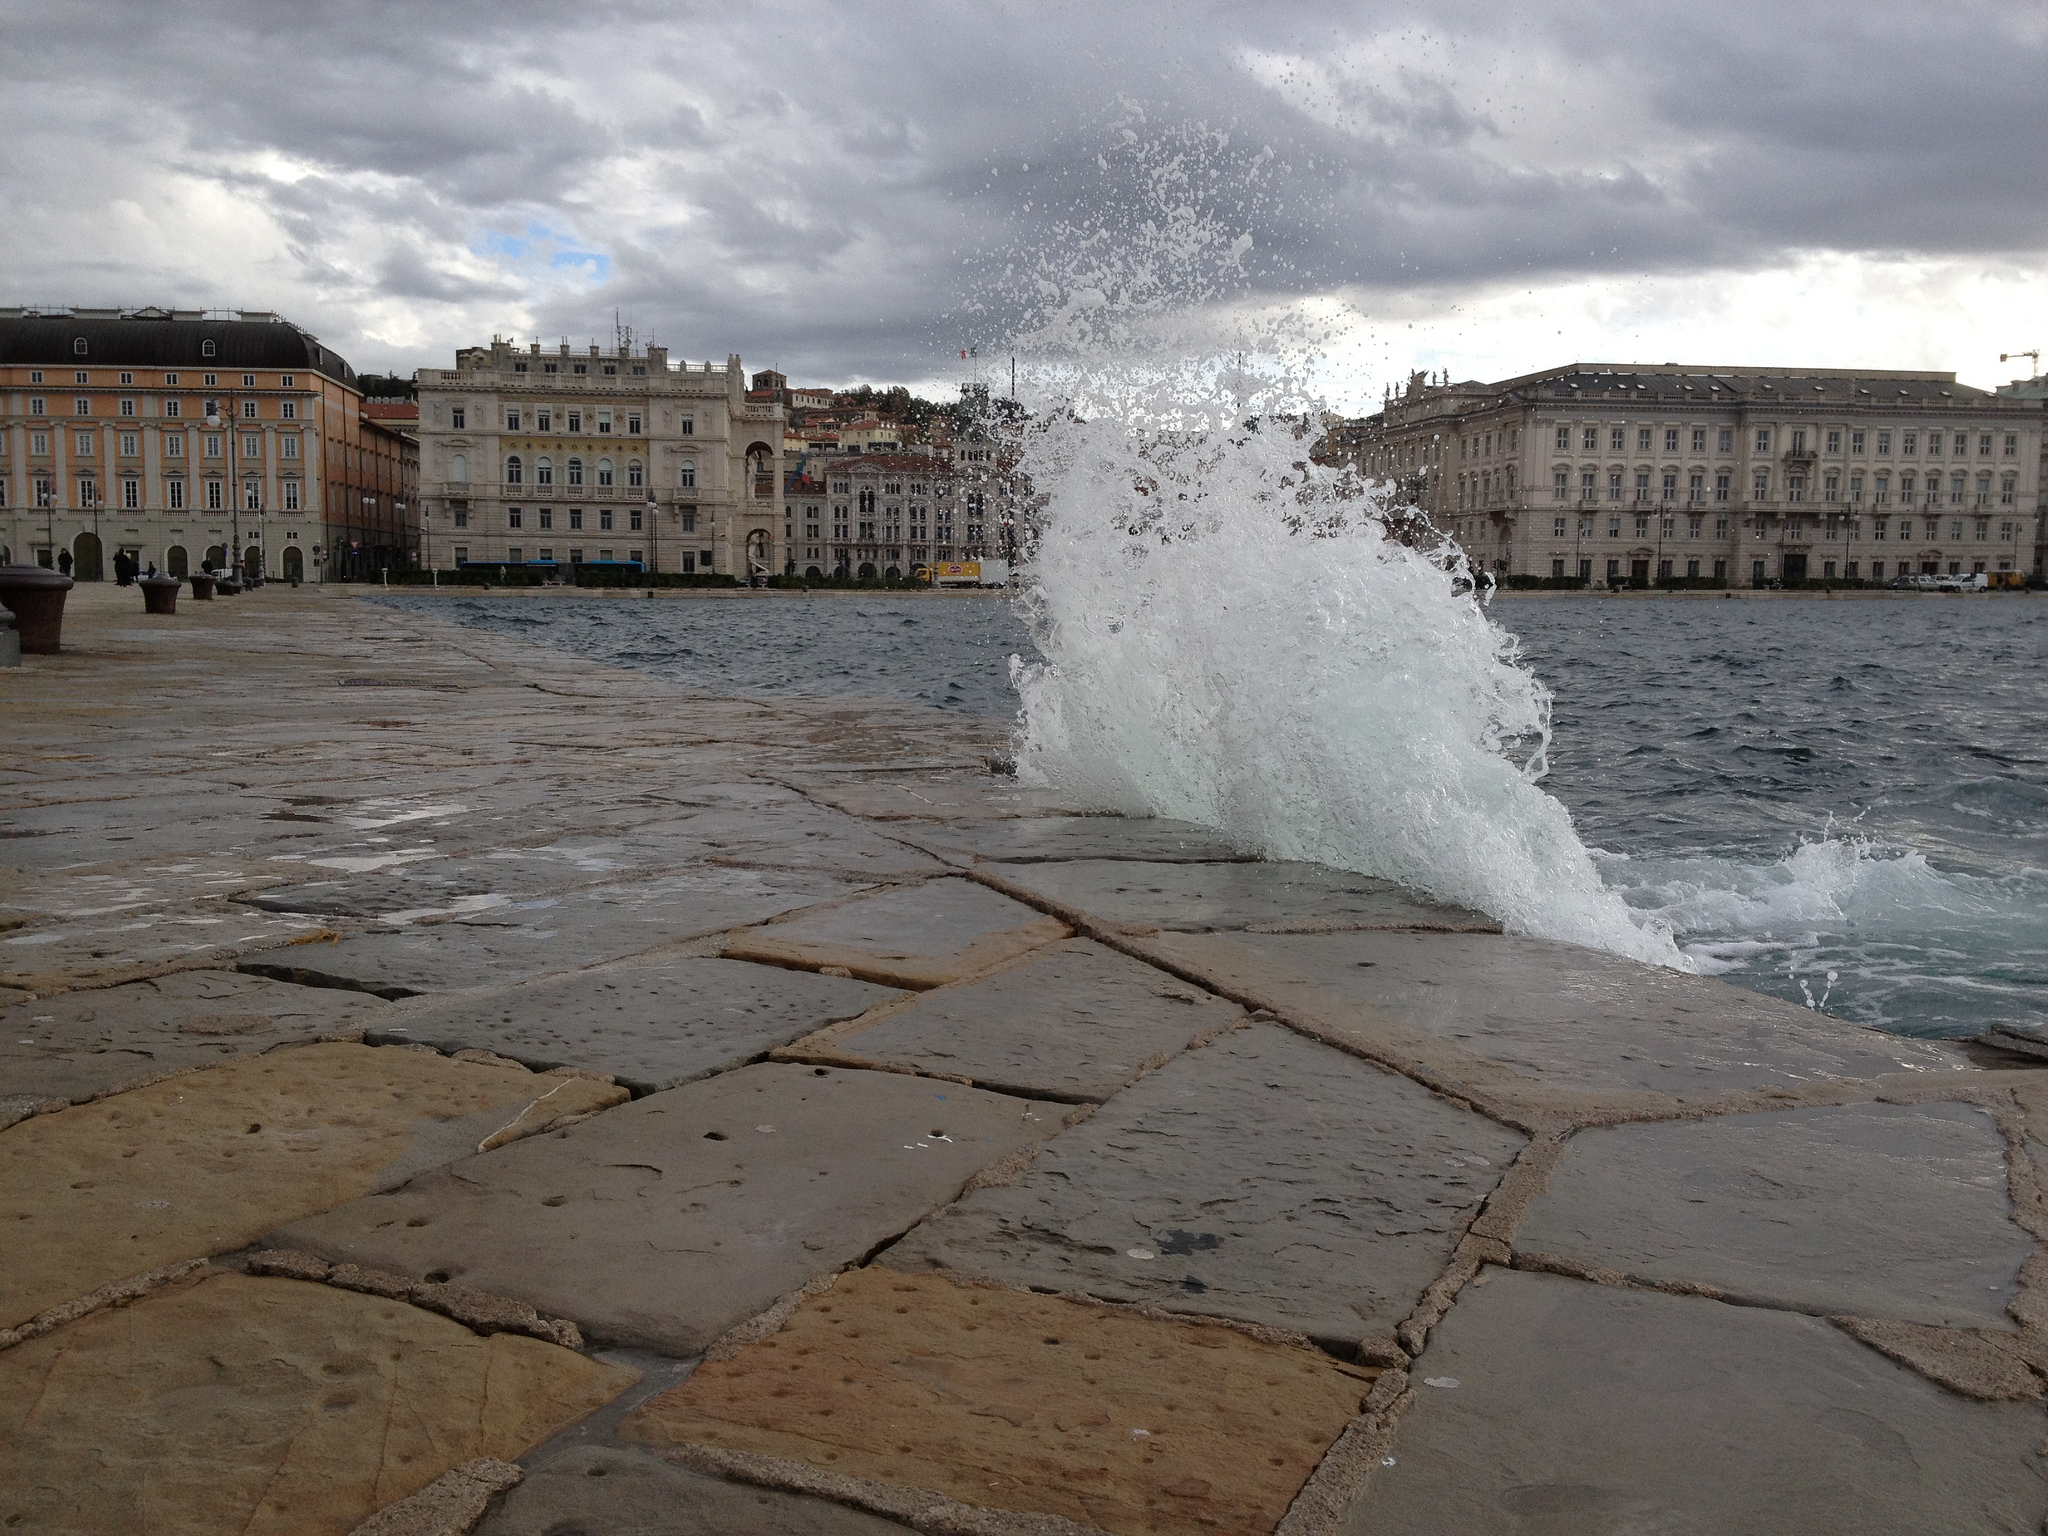 Molo audace a Trieste - Xenja Santarelli/flickr